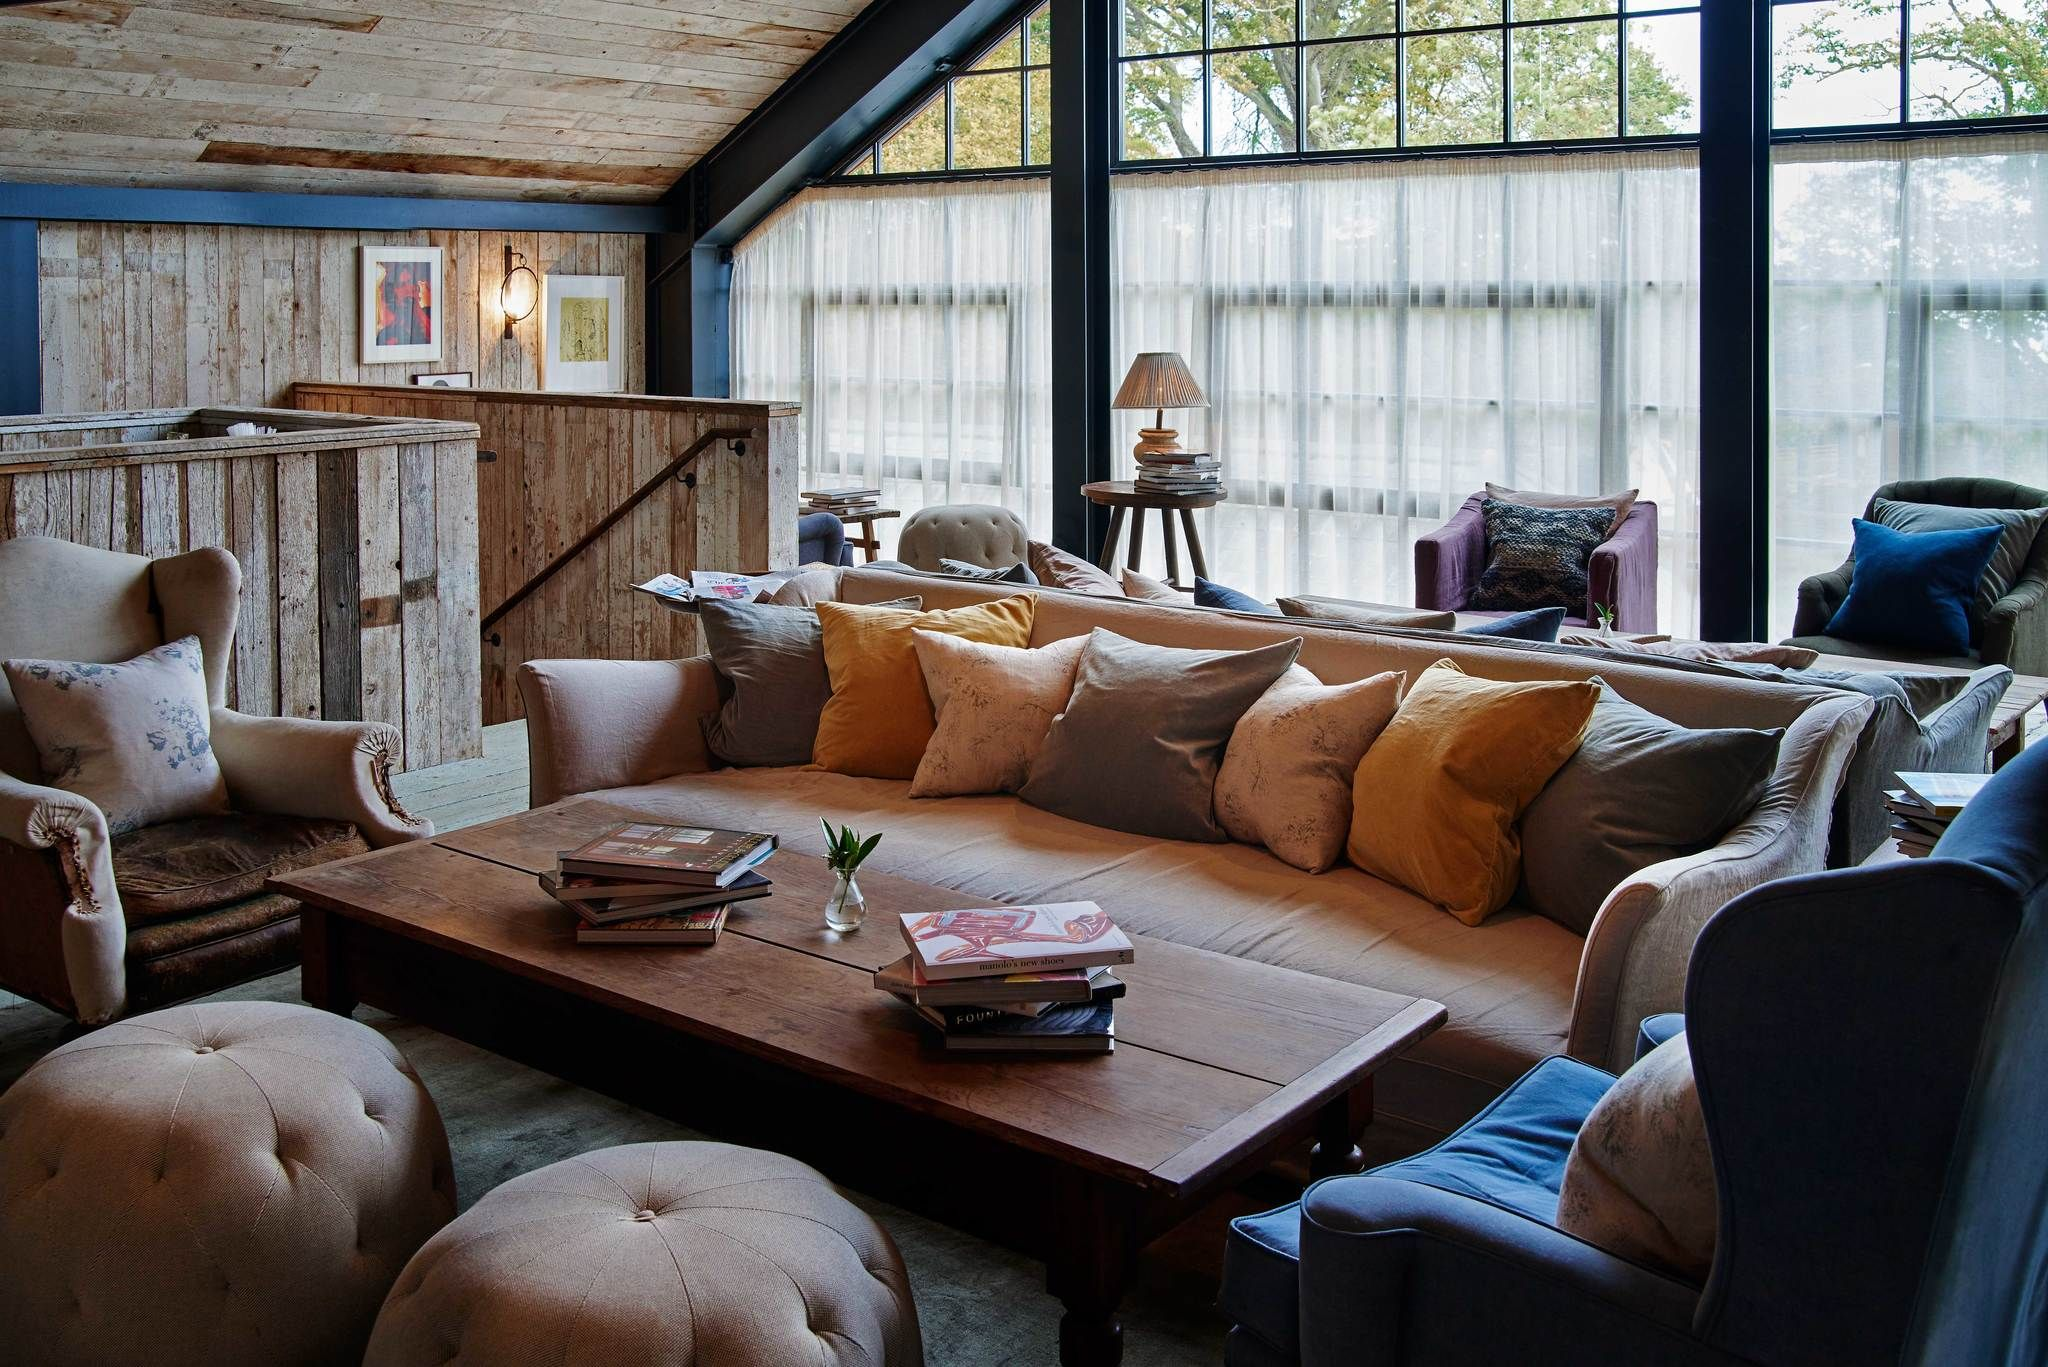 brocante buitenkeuken : Copyright_soho_farm_house_cabin_2bed_3 Catskills Cabin